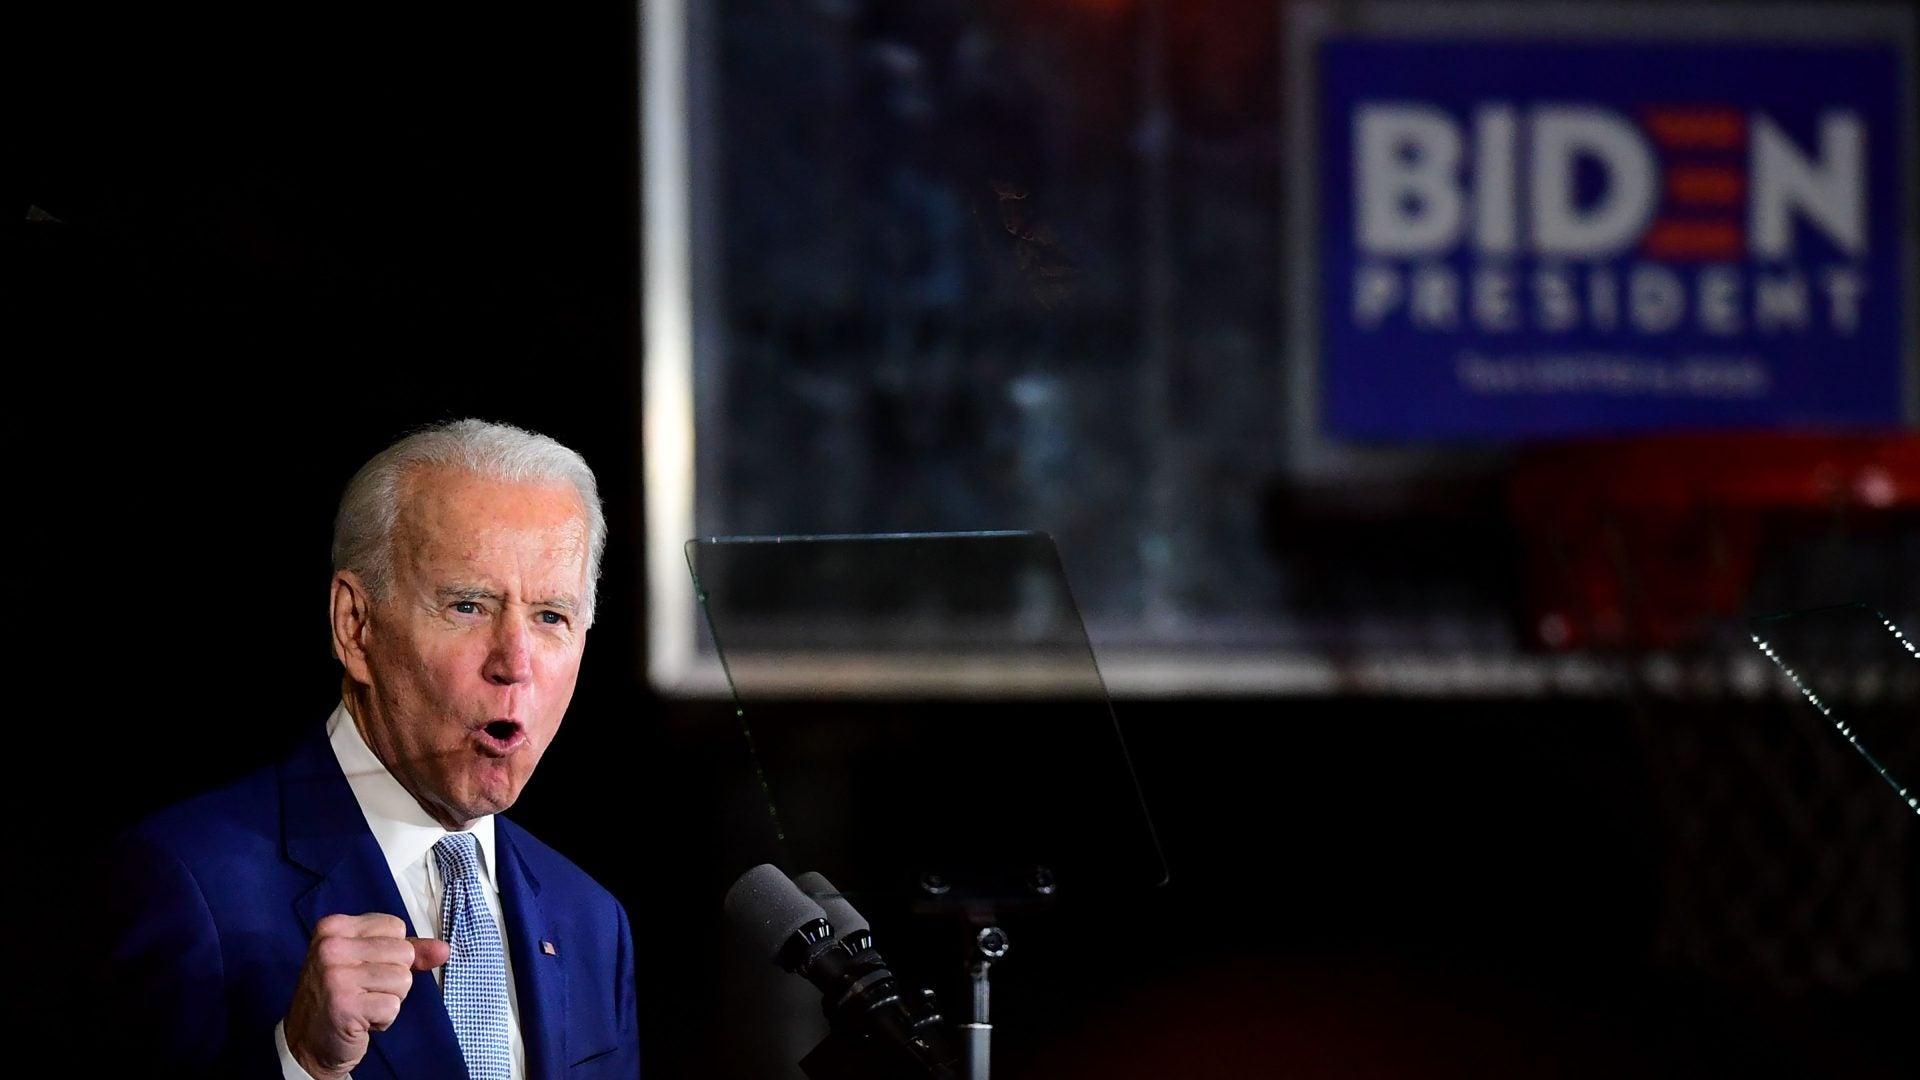 Joe Biden Makes Stunning Comeback With Super Tuesday Wins